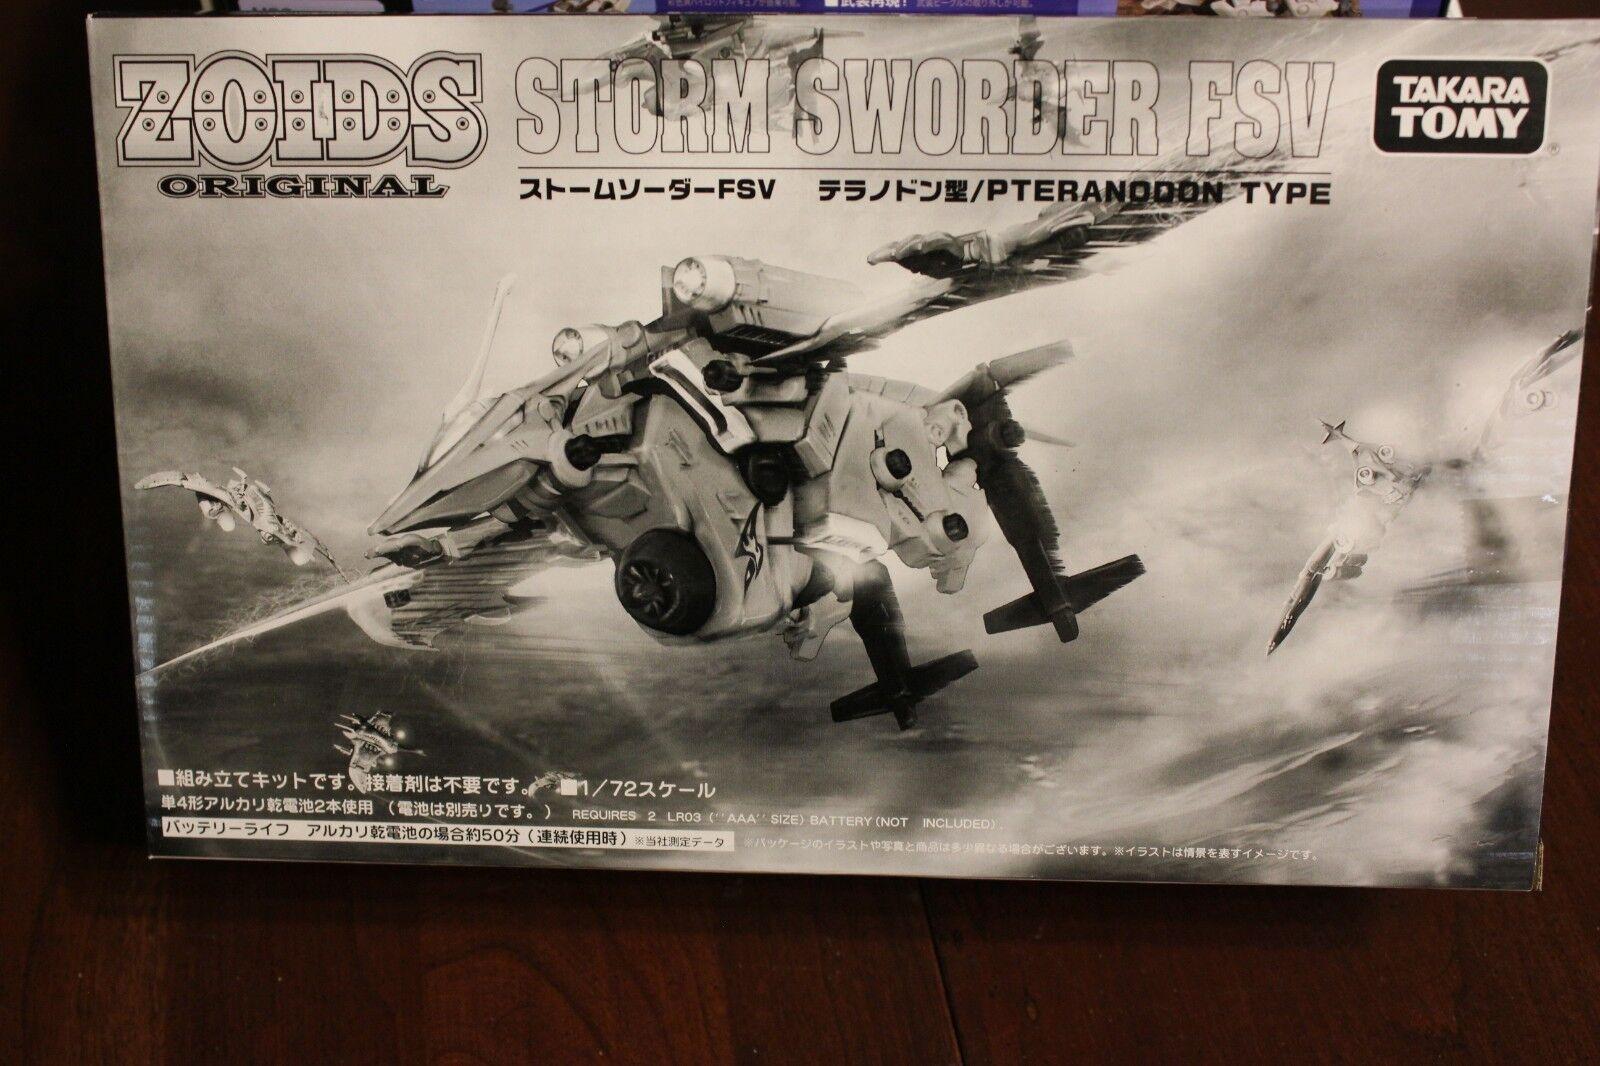 Zoids Original  Storm Sworder FSV Mint in Box  beaucoup de concessions